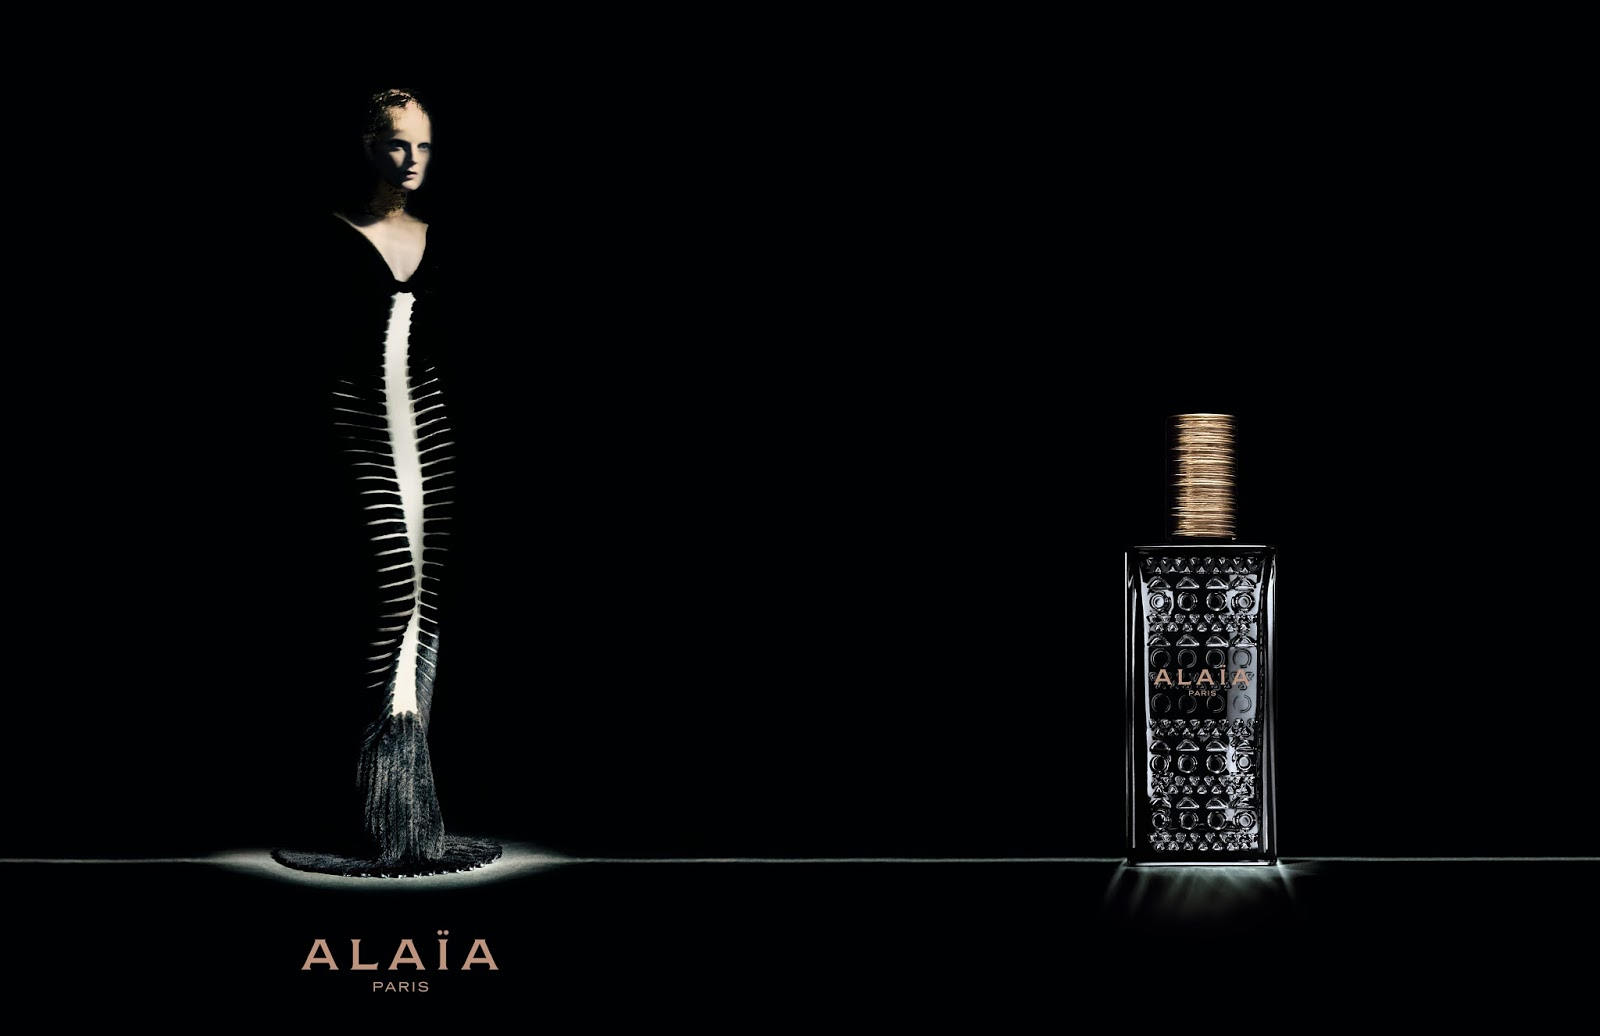 Plakt reklamowy Alaia Paris